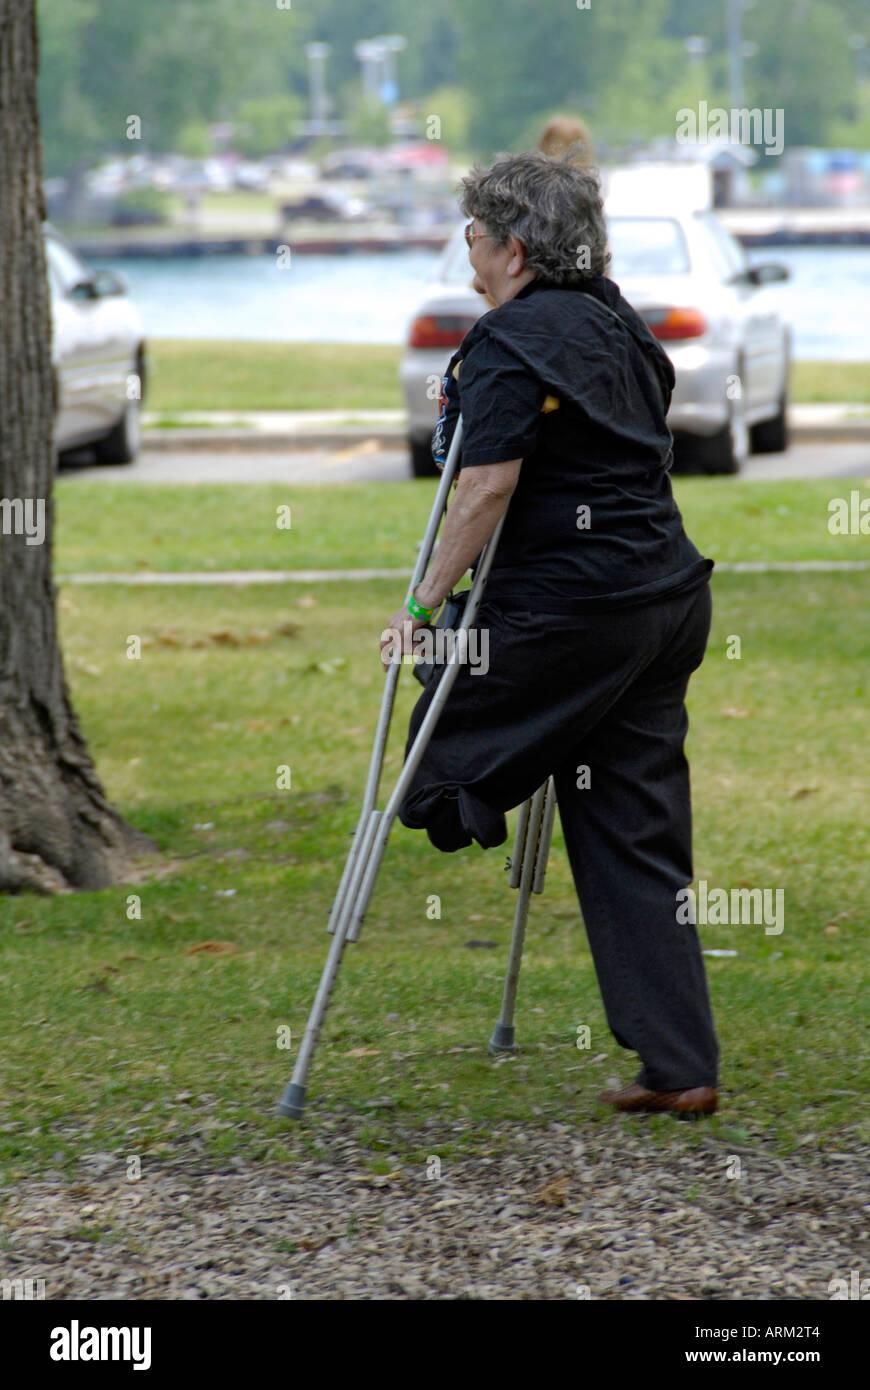 Handicap one leg - 1 8